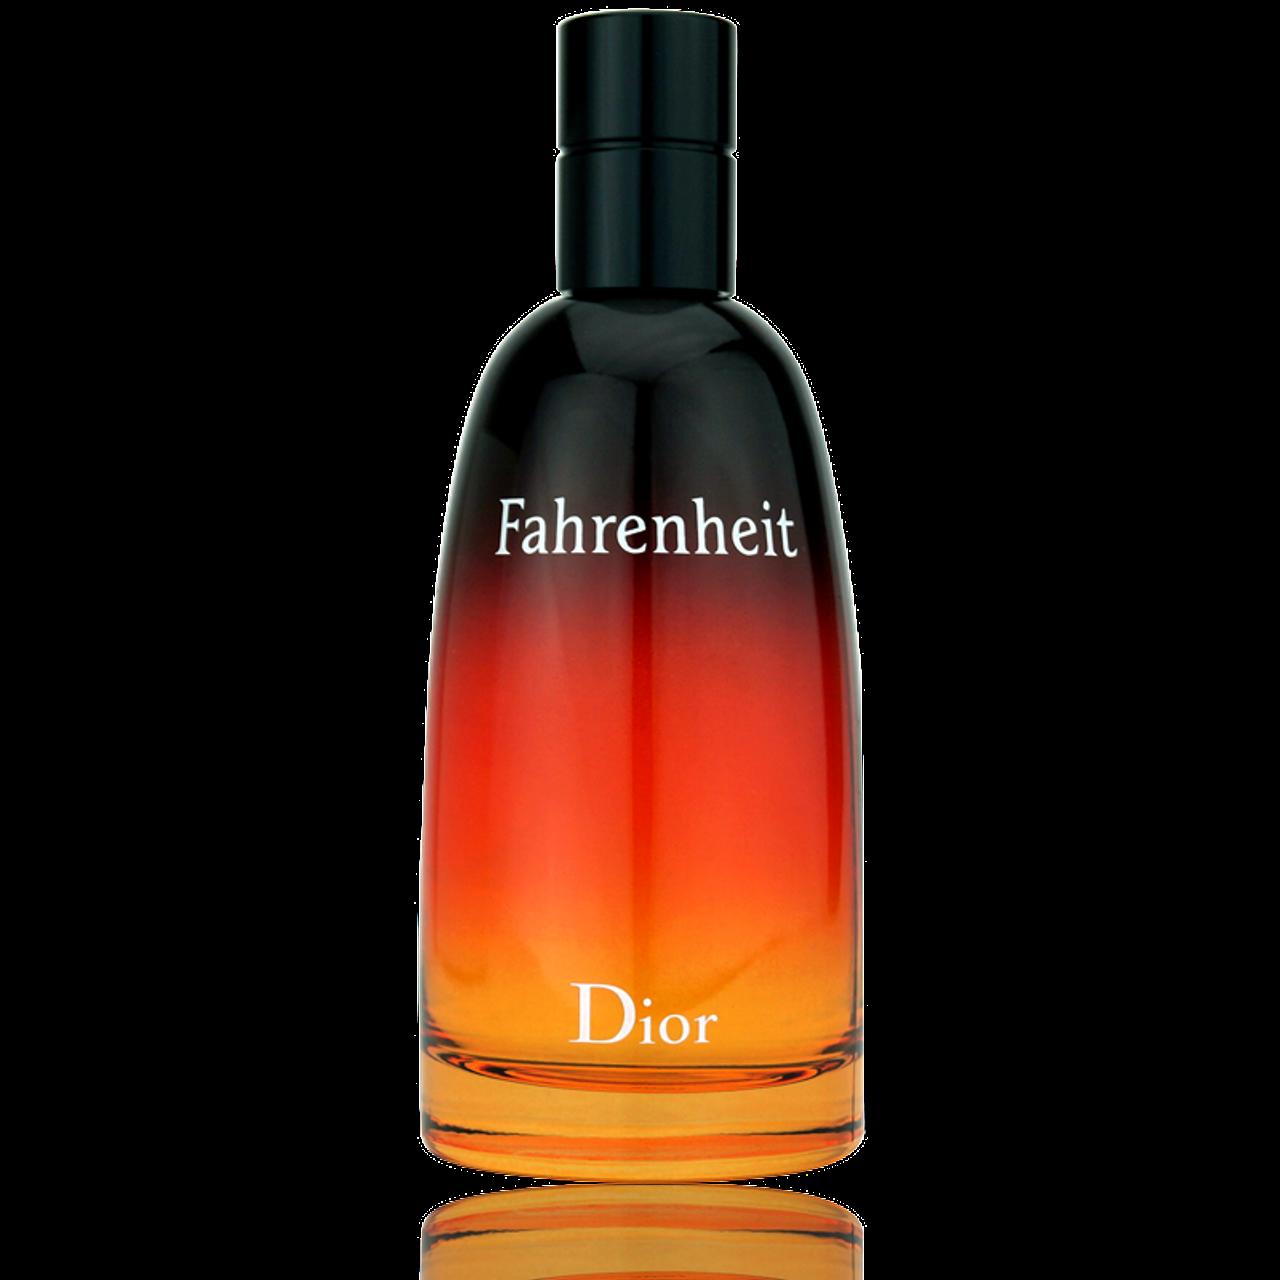 Dior Fahrenheit After Shave 50ml